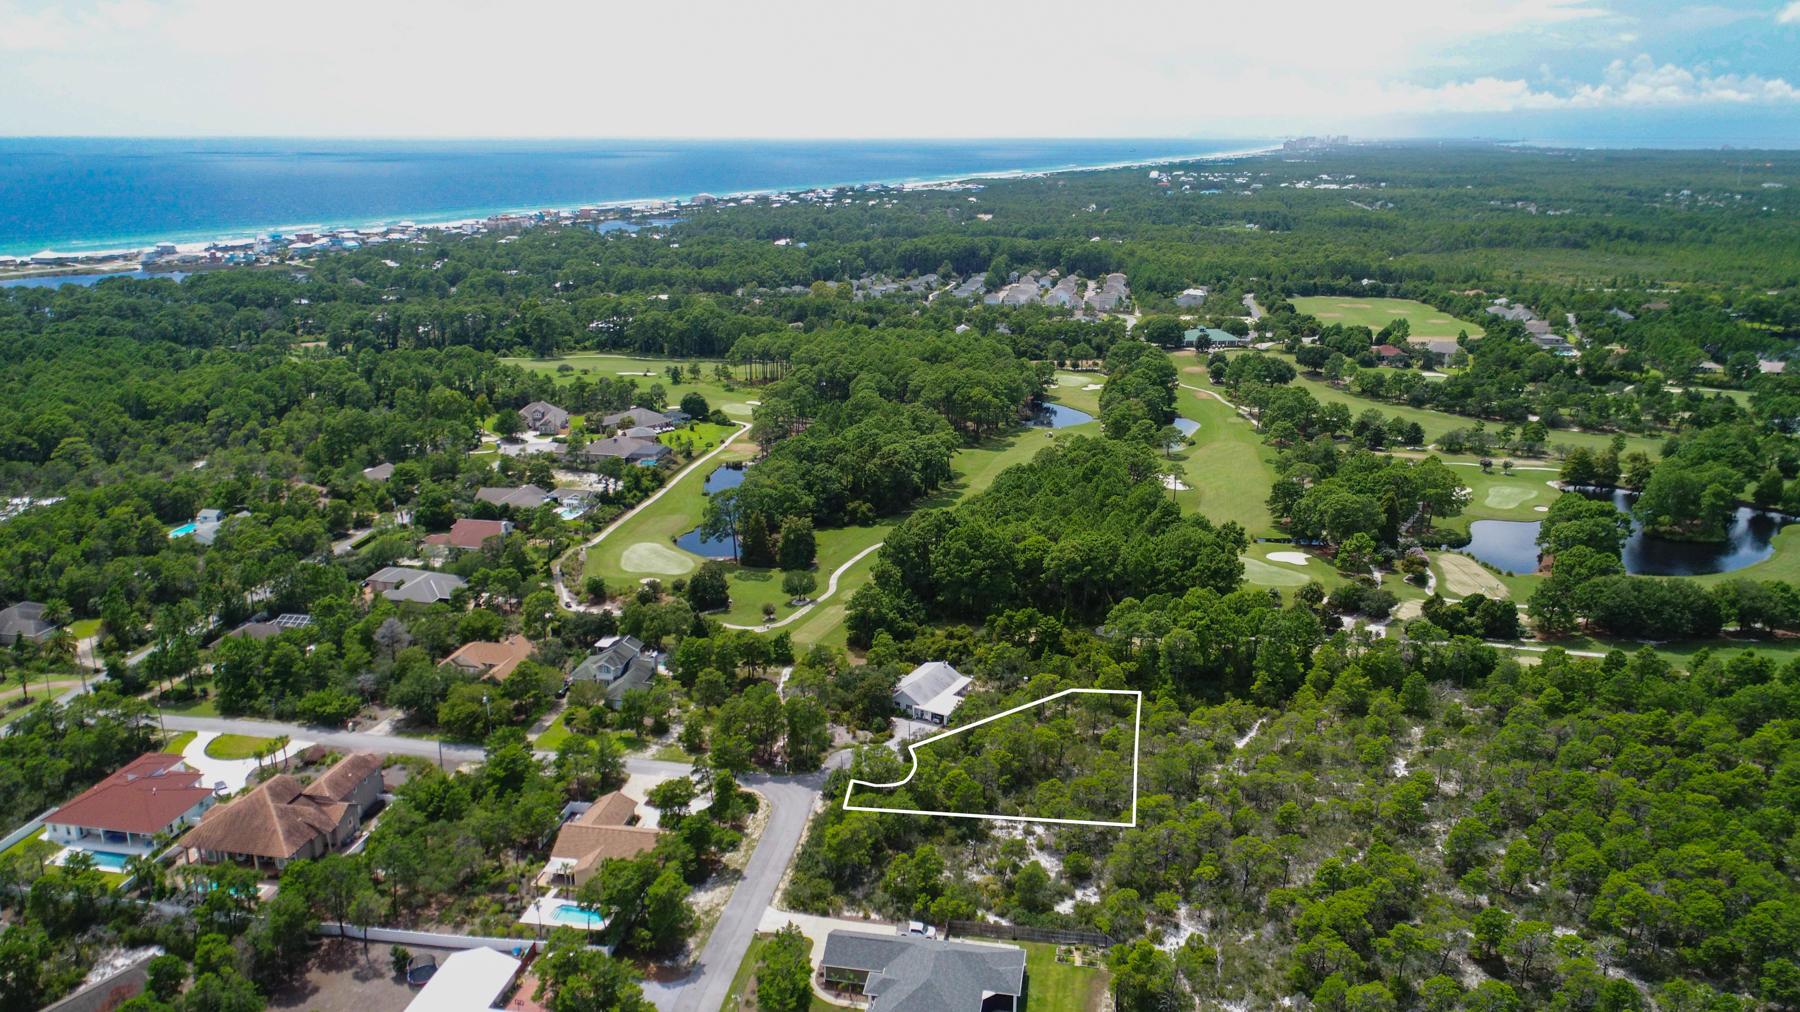 Photo of home for sale at Lot 11 Lot 11 Blk B Ridge Rd, Santa Rosa Beach FL